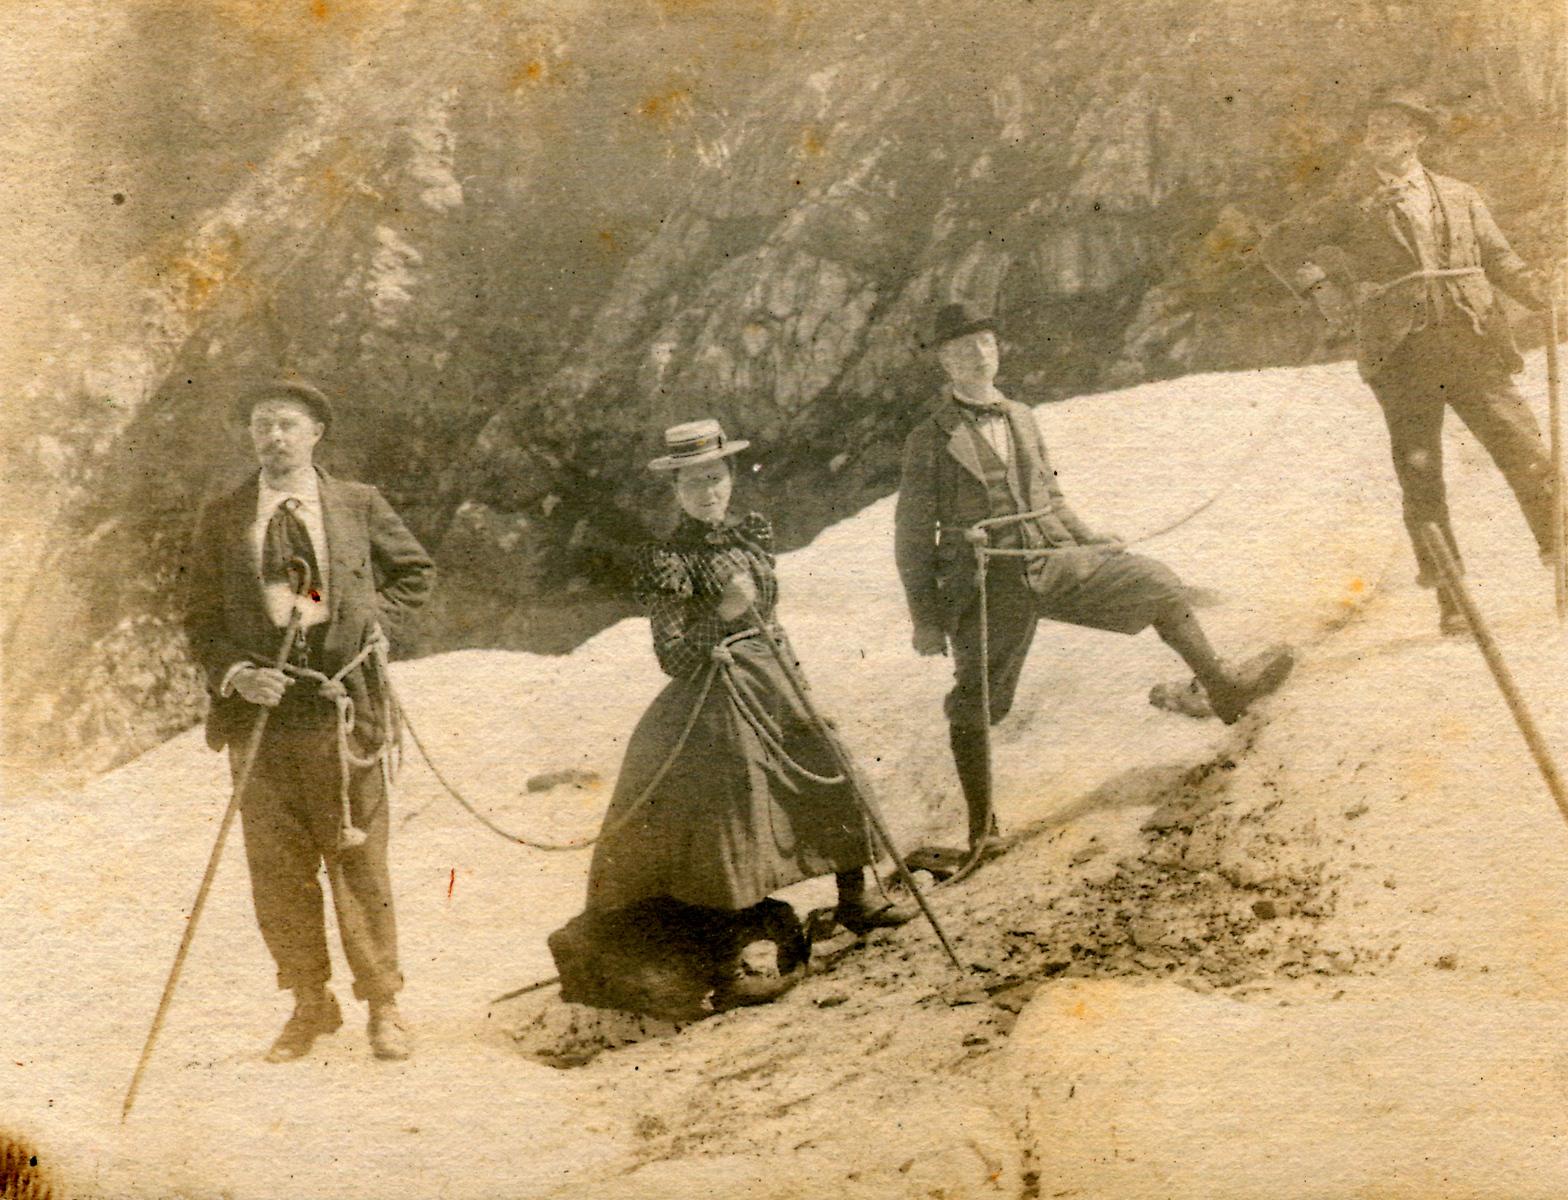 Alpinists ascending the Jungfrau, 1910/20